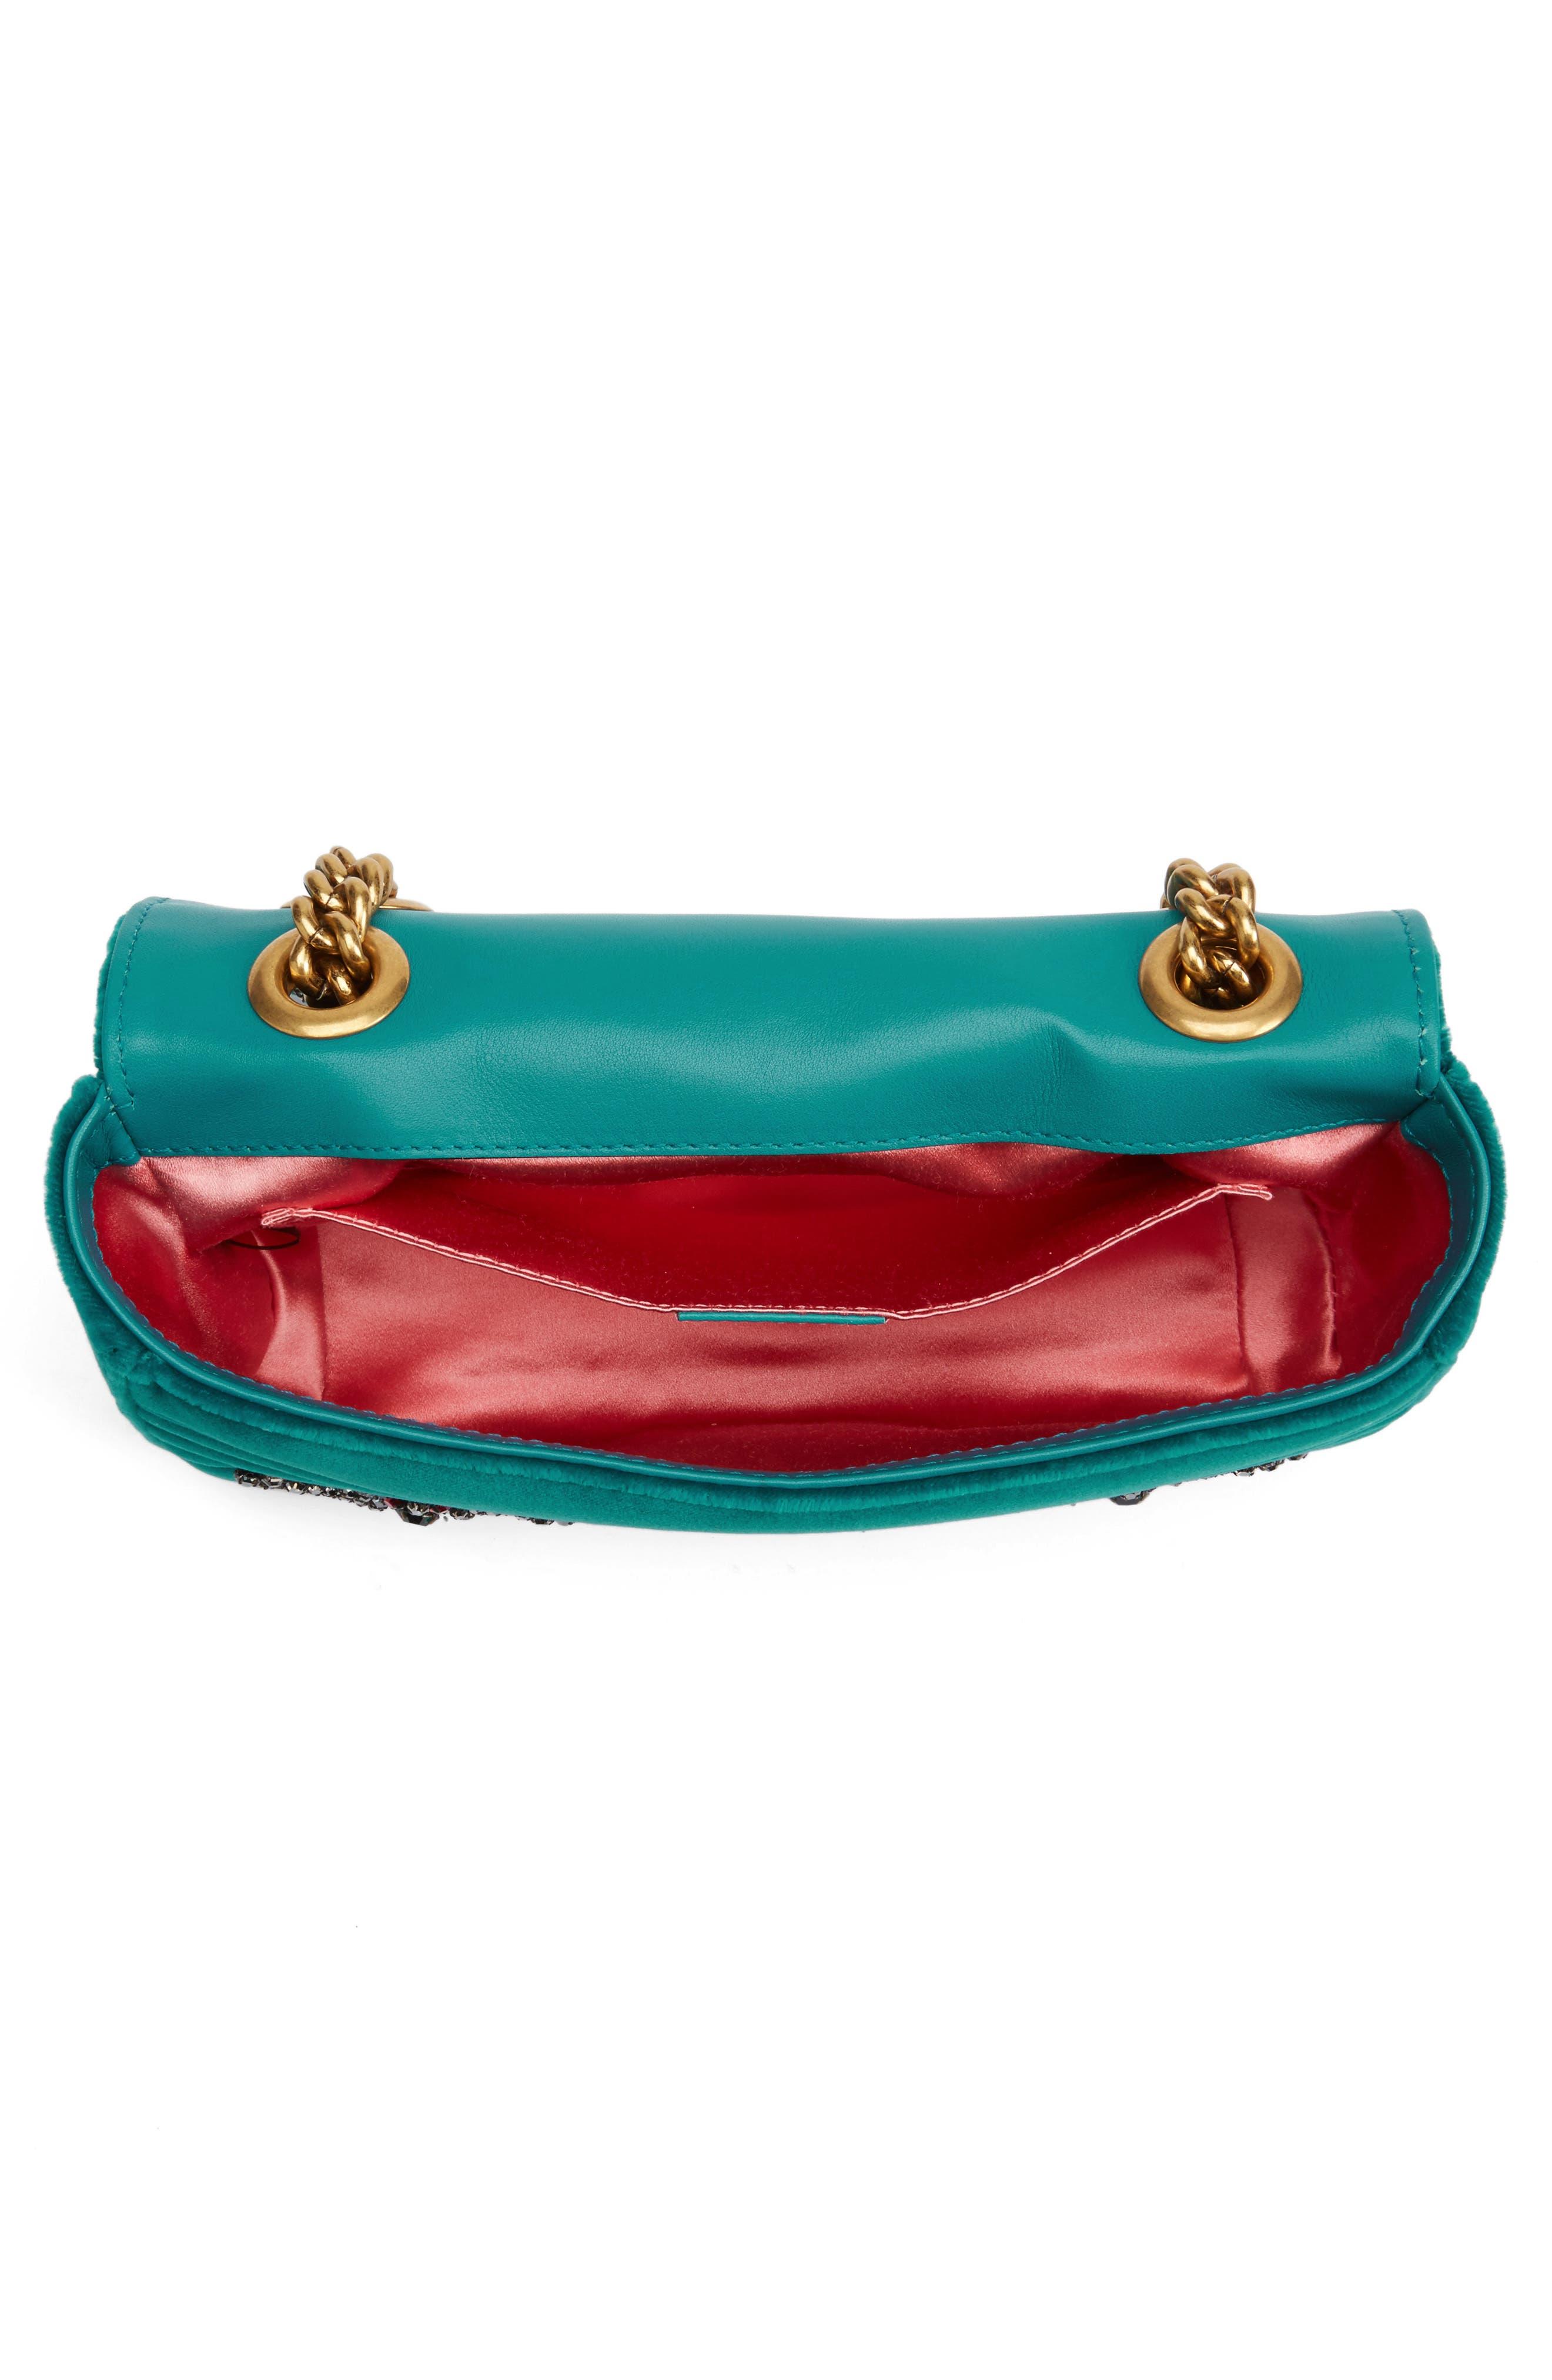 GUCCI, Mini GG Marmont Matelassé Velvet Shoulder Bag, Alternate thumbnail 4, color, PIVONE